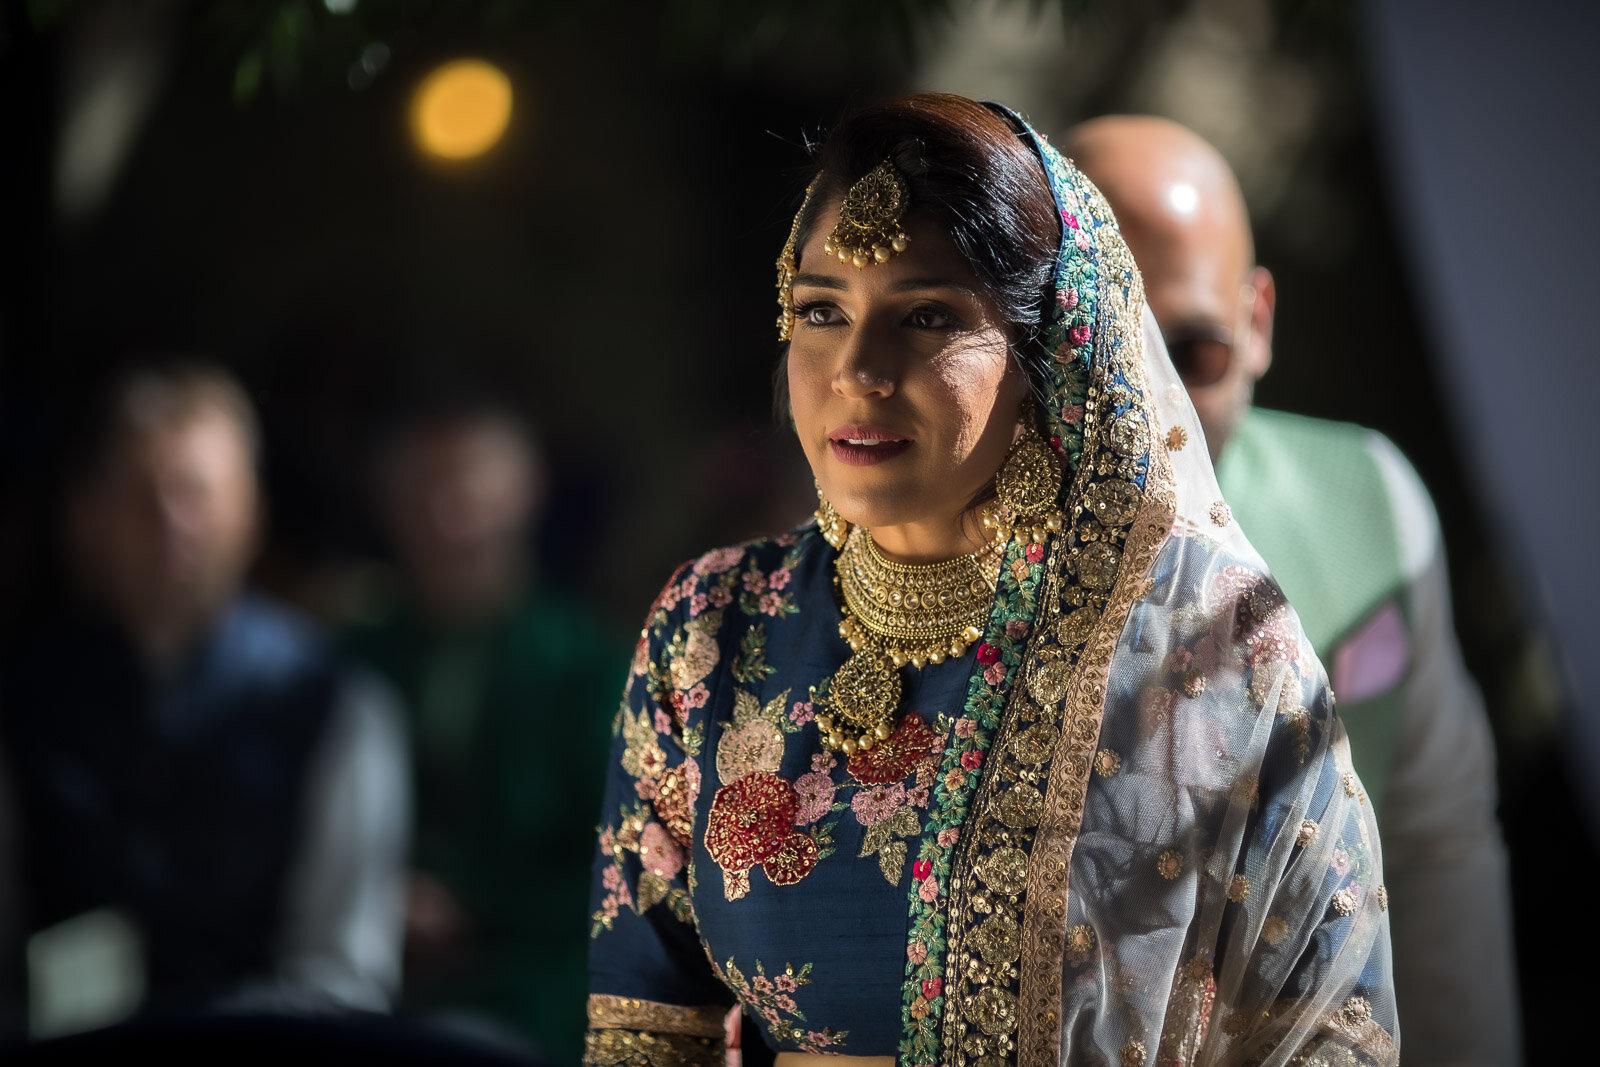 Destination Indian Wedding in Borgo San Faustino 14.jpg